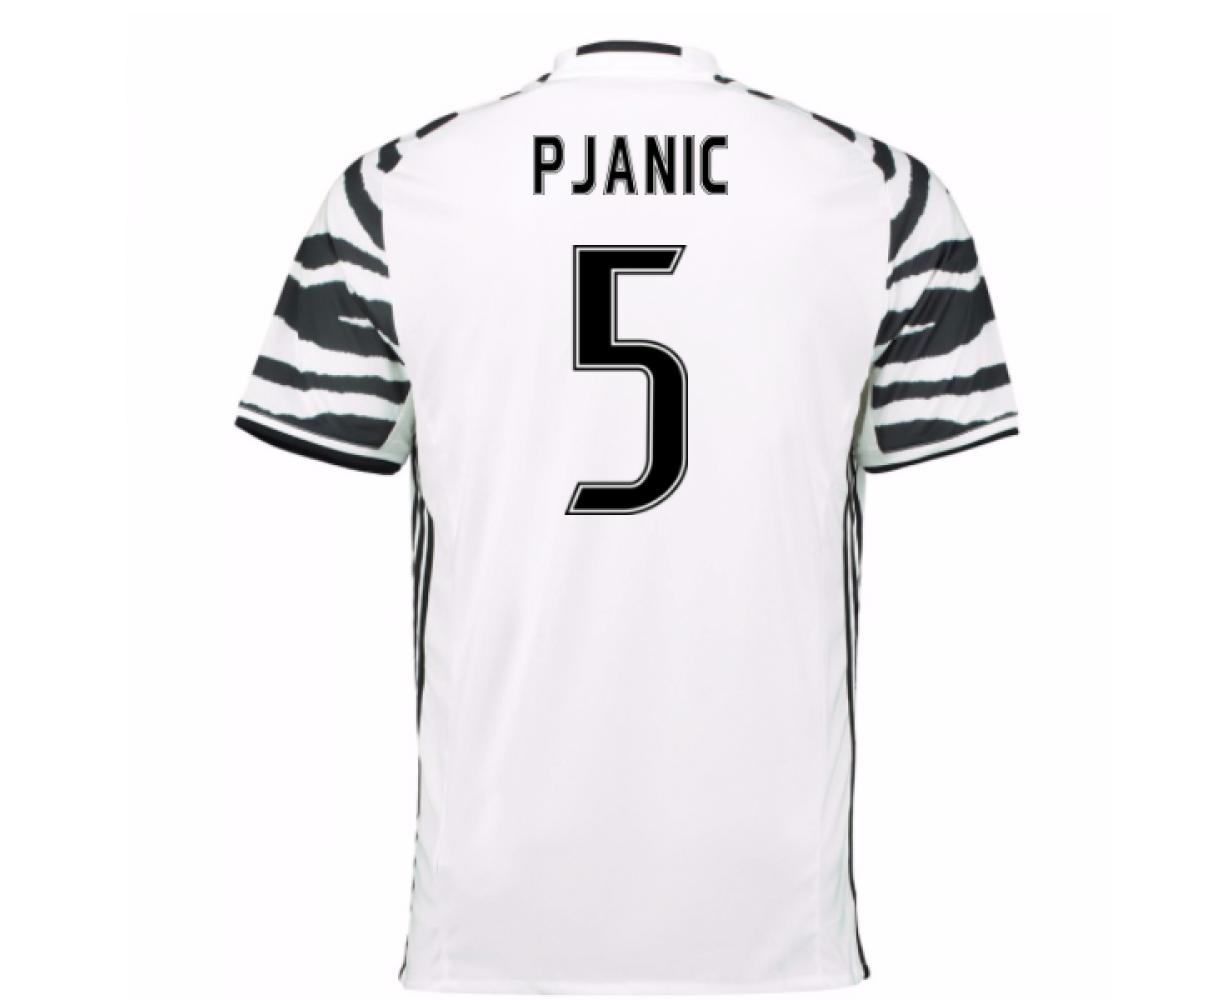 1b3e056a6 2016-17 Juventus 3rd Shirt (Pjanic 5) - Kids